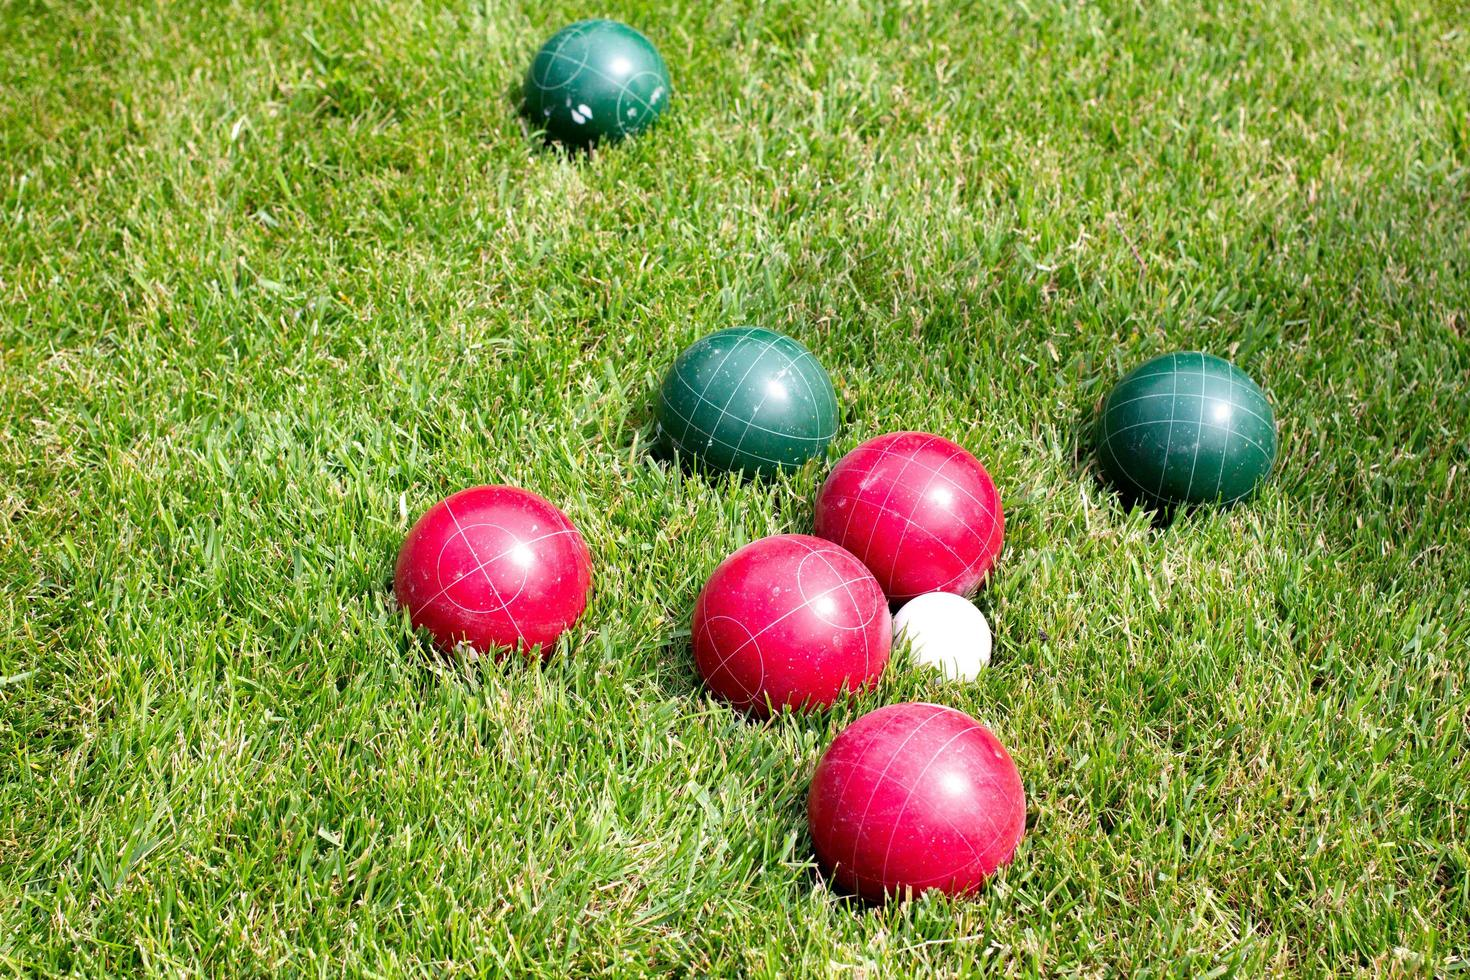 palle da croquet sull'erba soleggiata foto